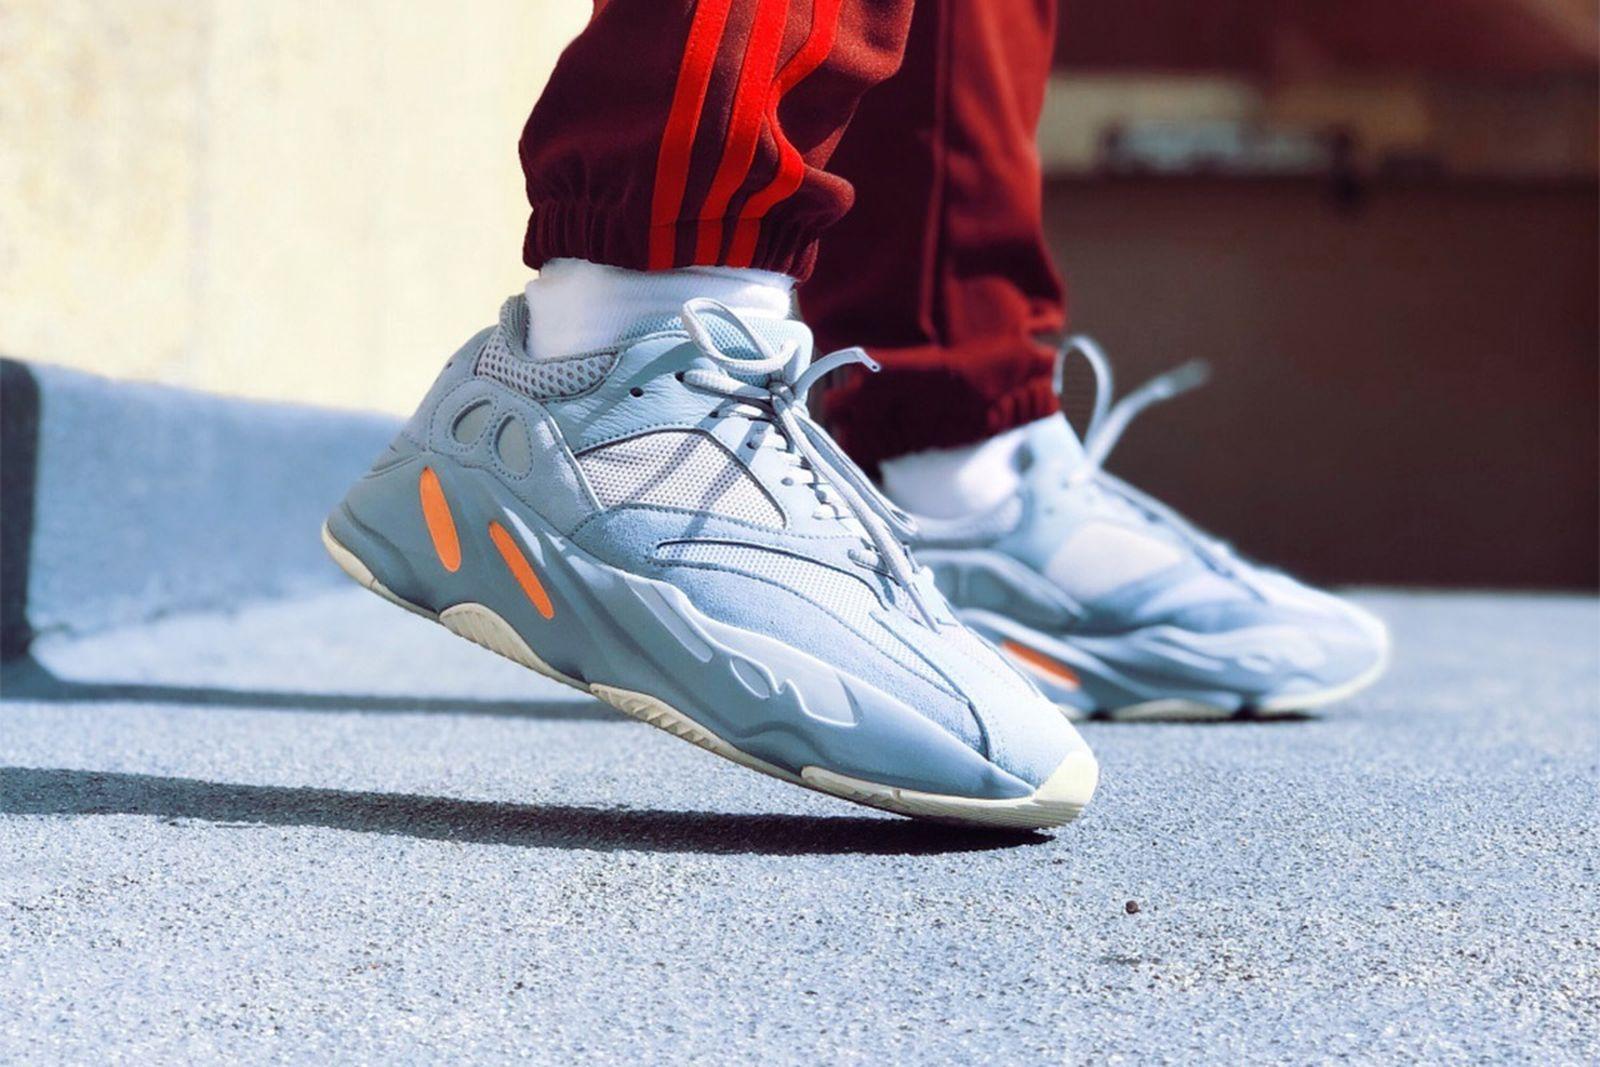 yeezy boost 700 best instagram sneaker photos OFF-WHITE x Nike Blazer Mid Raf Simons Replicant Ozweego adidas originals YEEZY Boost 700 v2